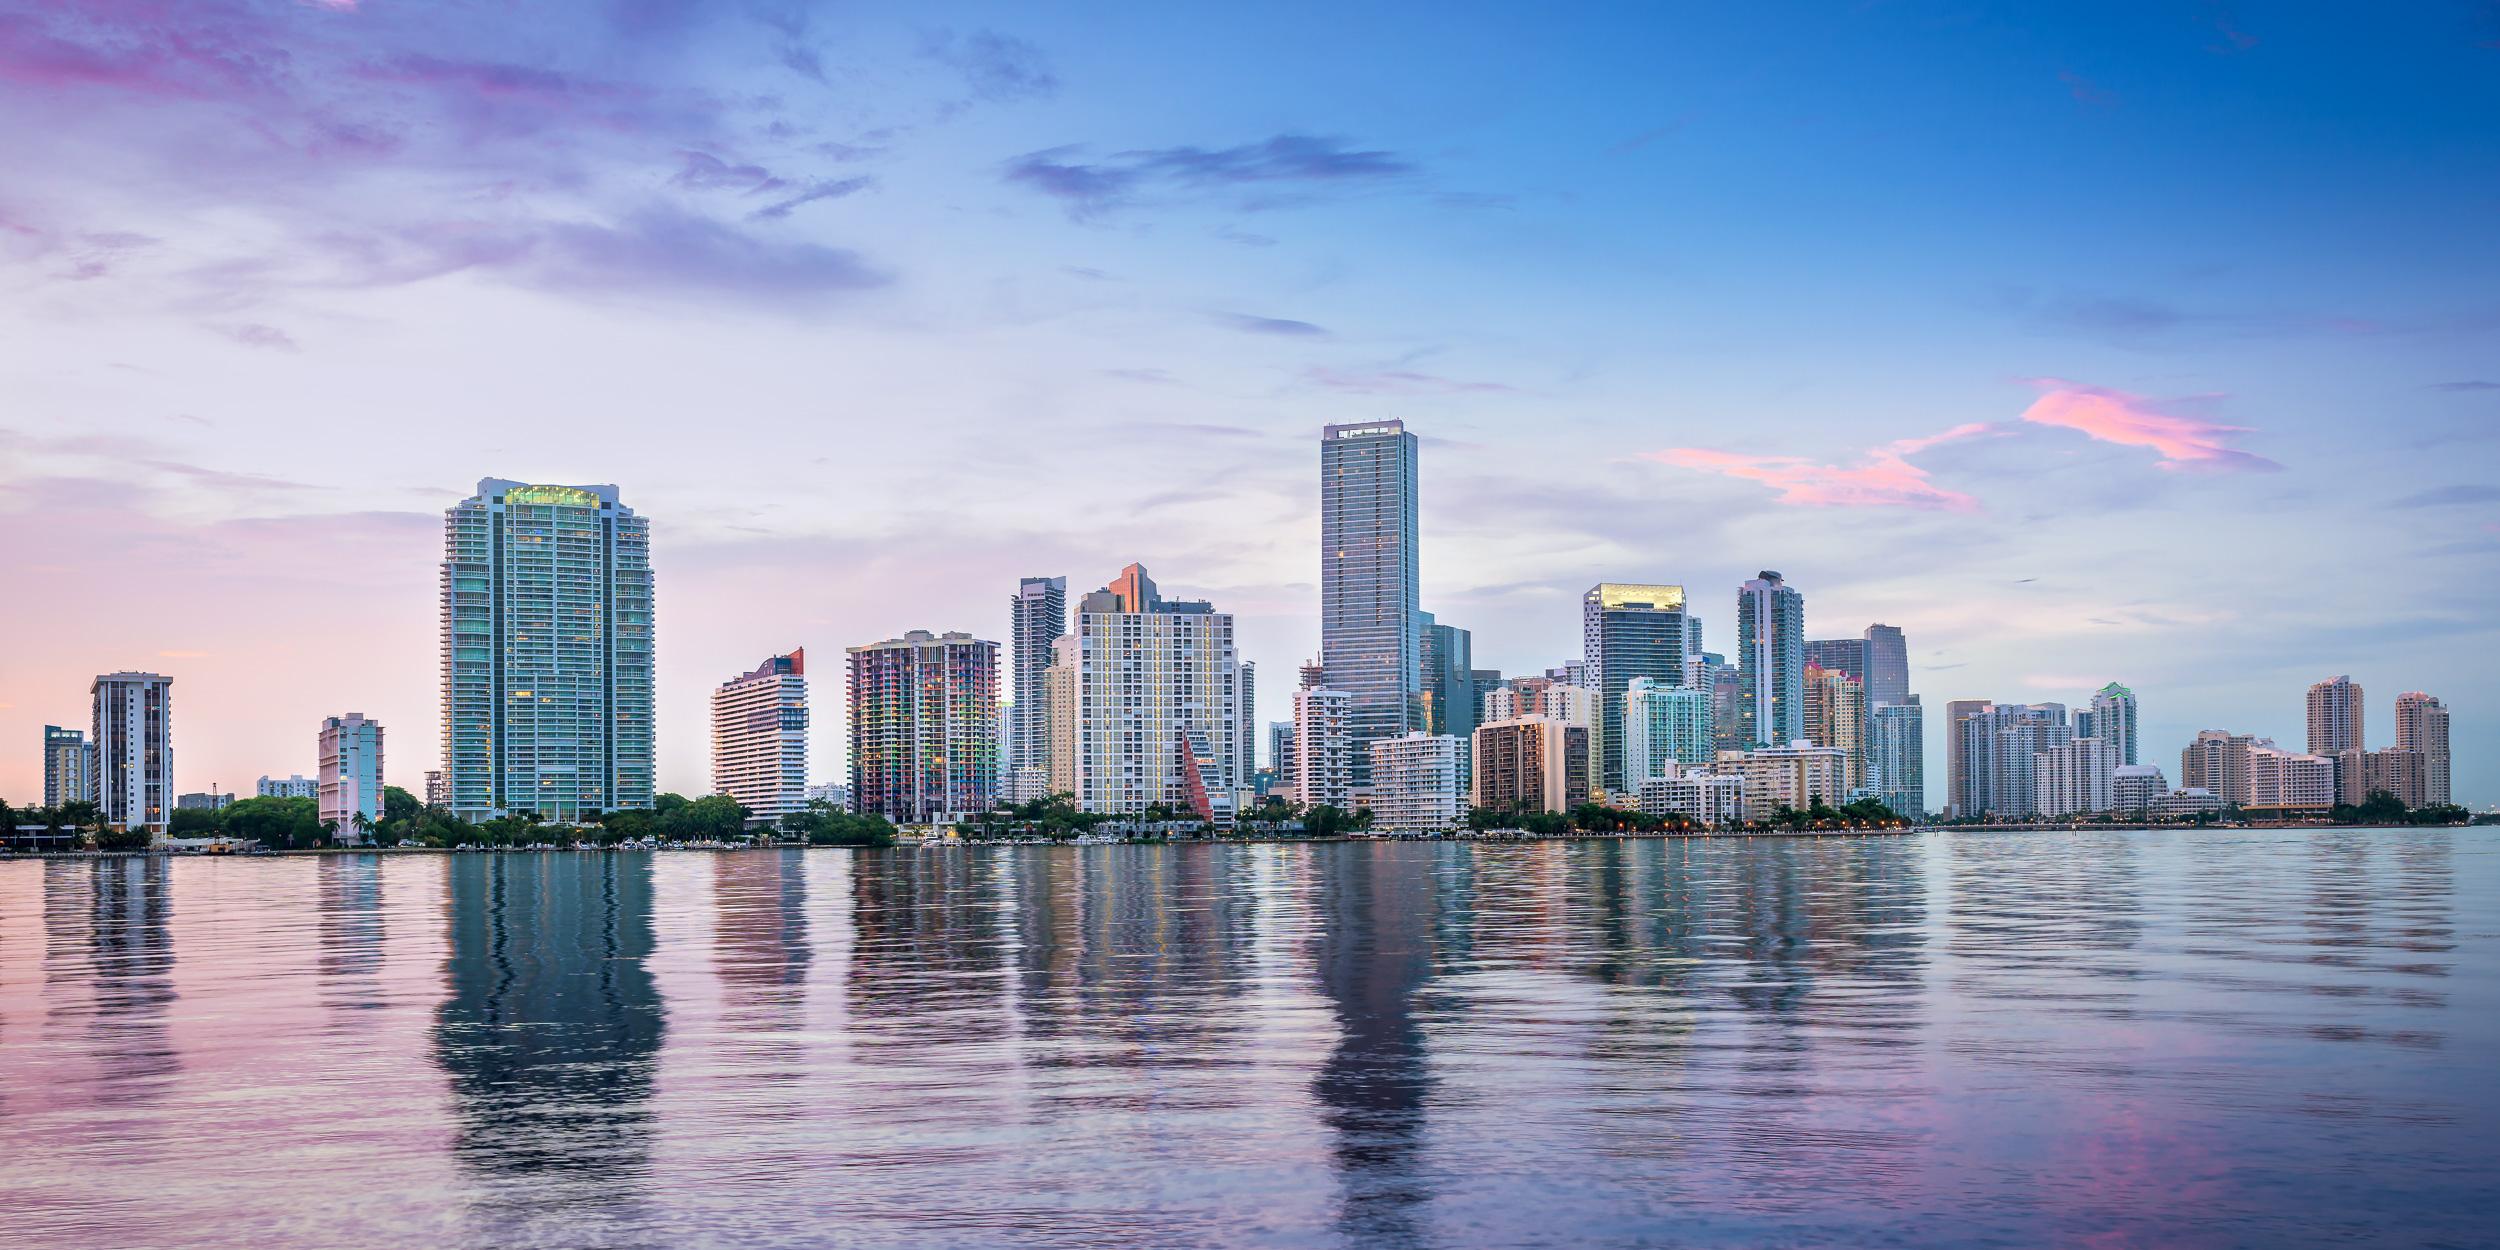 Miami_Skyline_Rickenbauker_Causeway-Franklin_Castillo_2.jpg